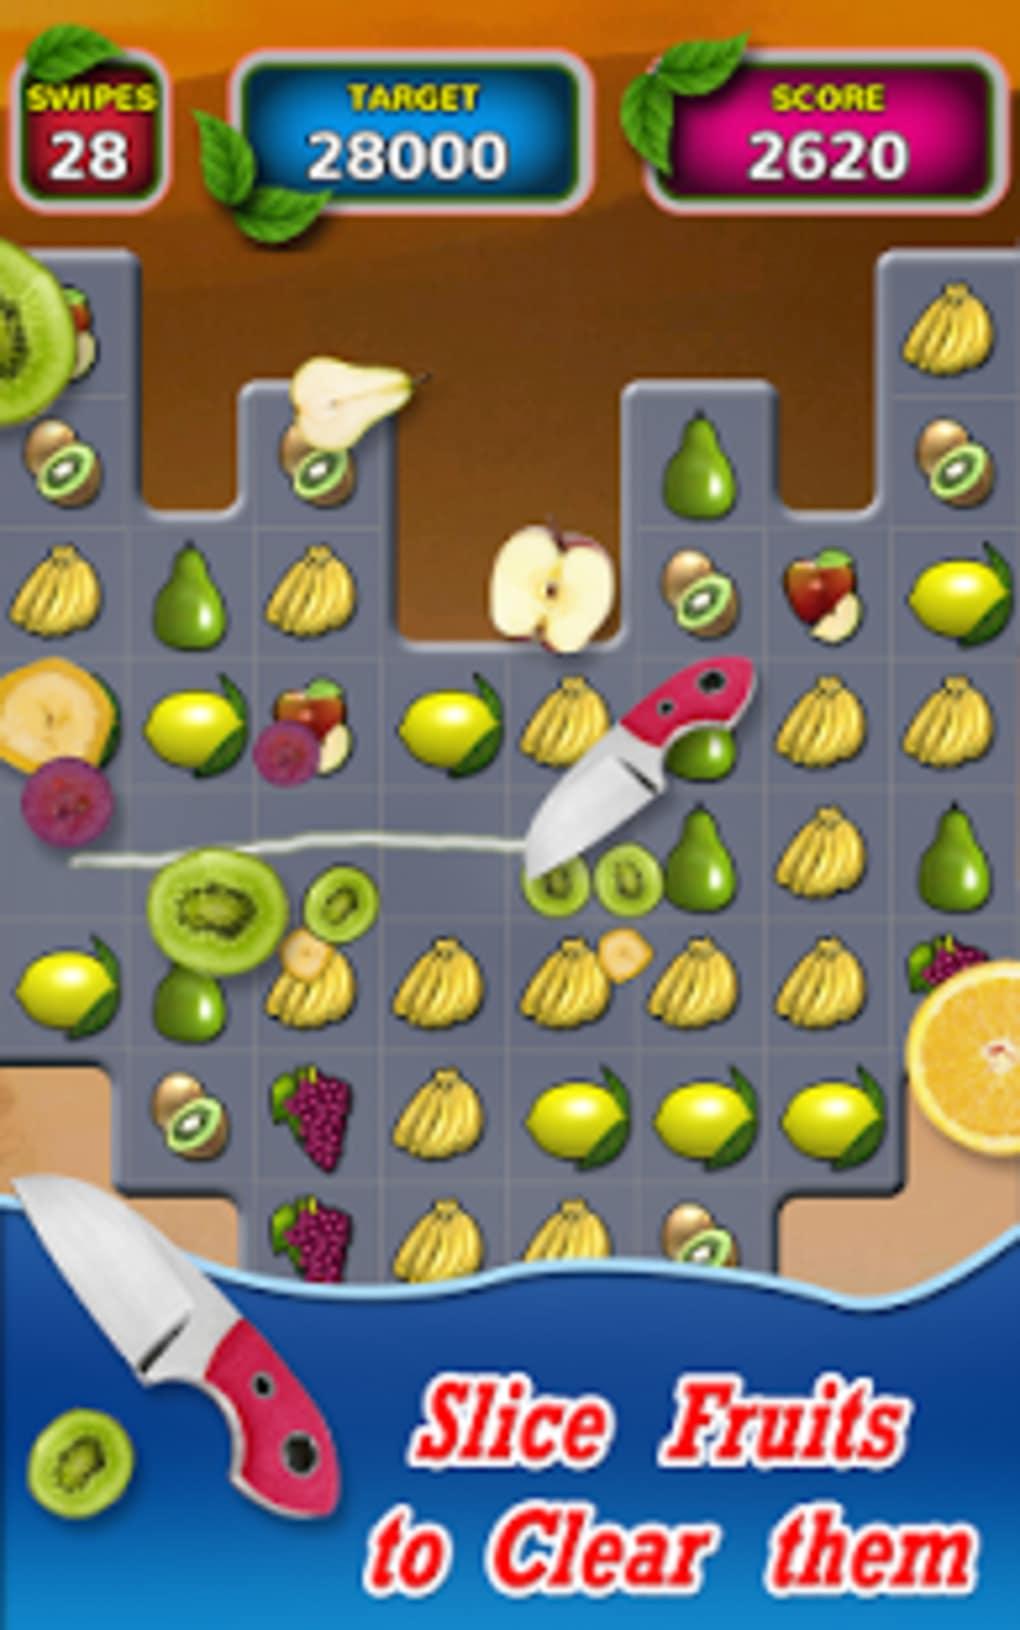 Swiped Fruits 2